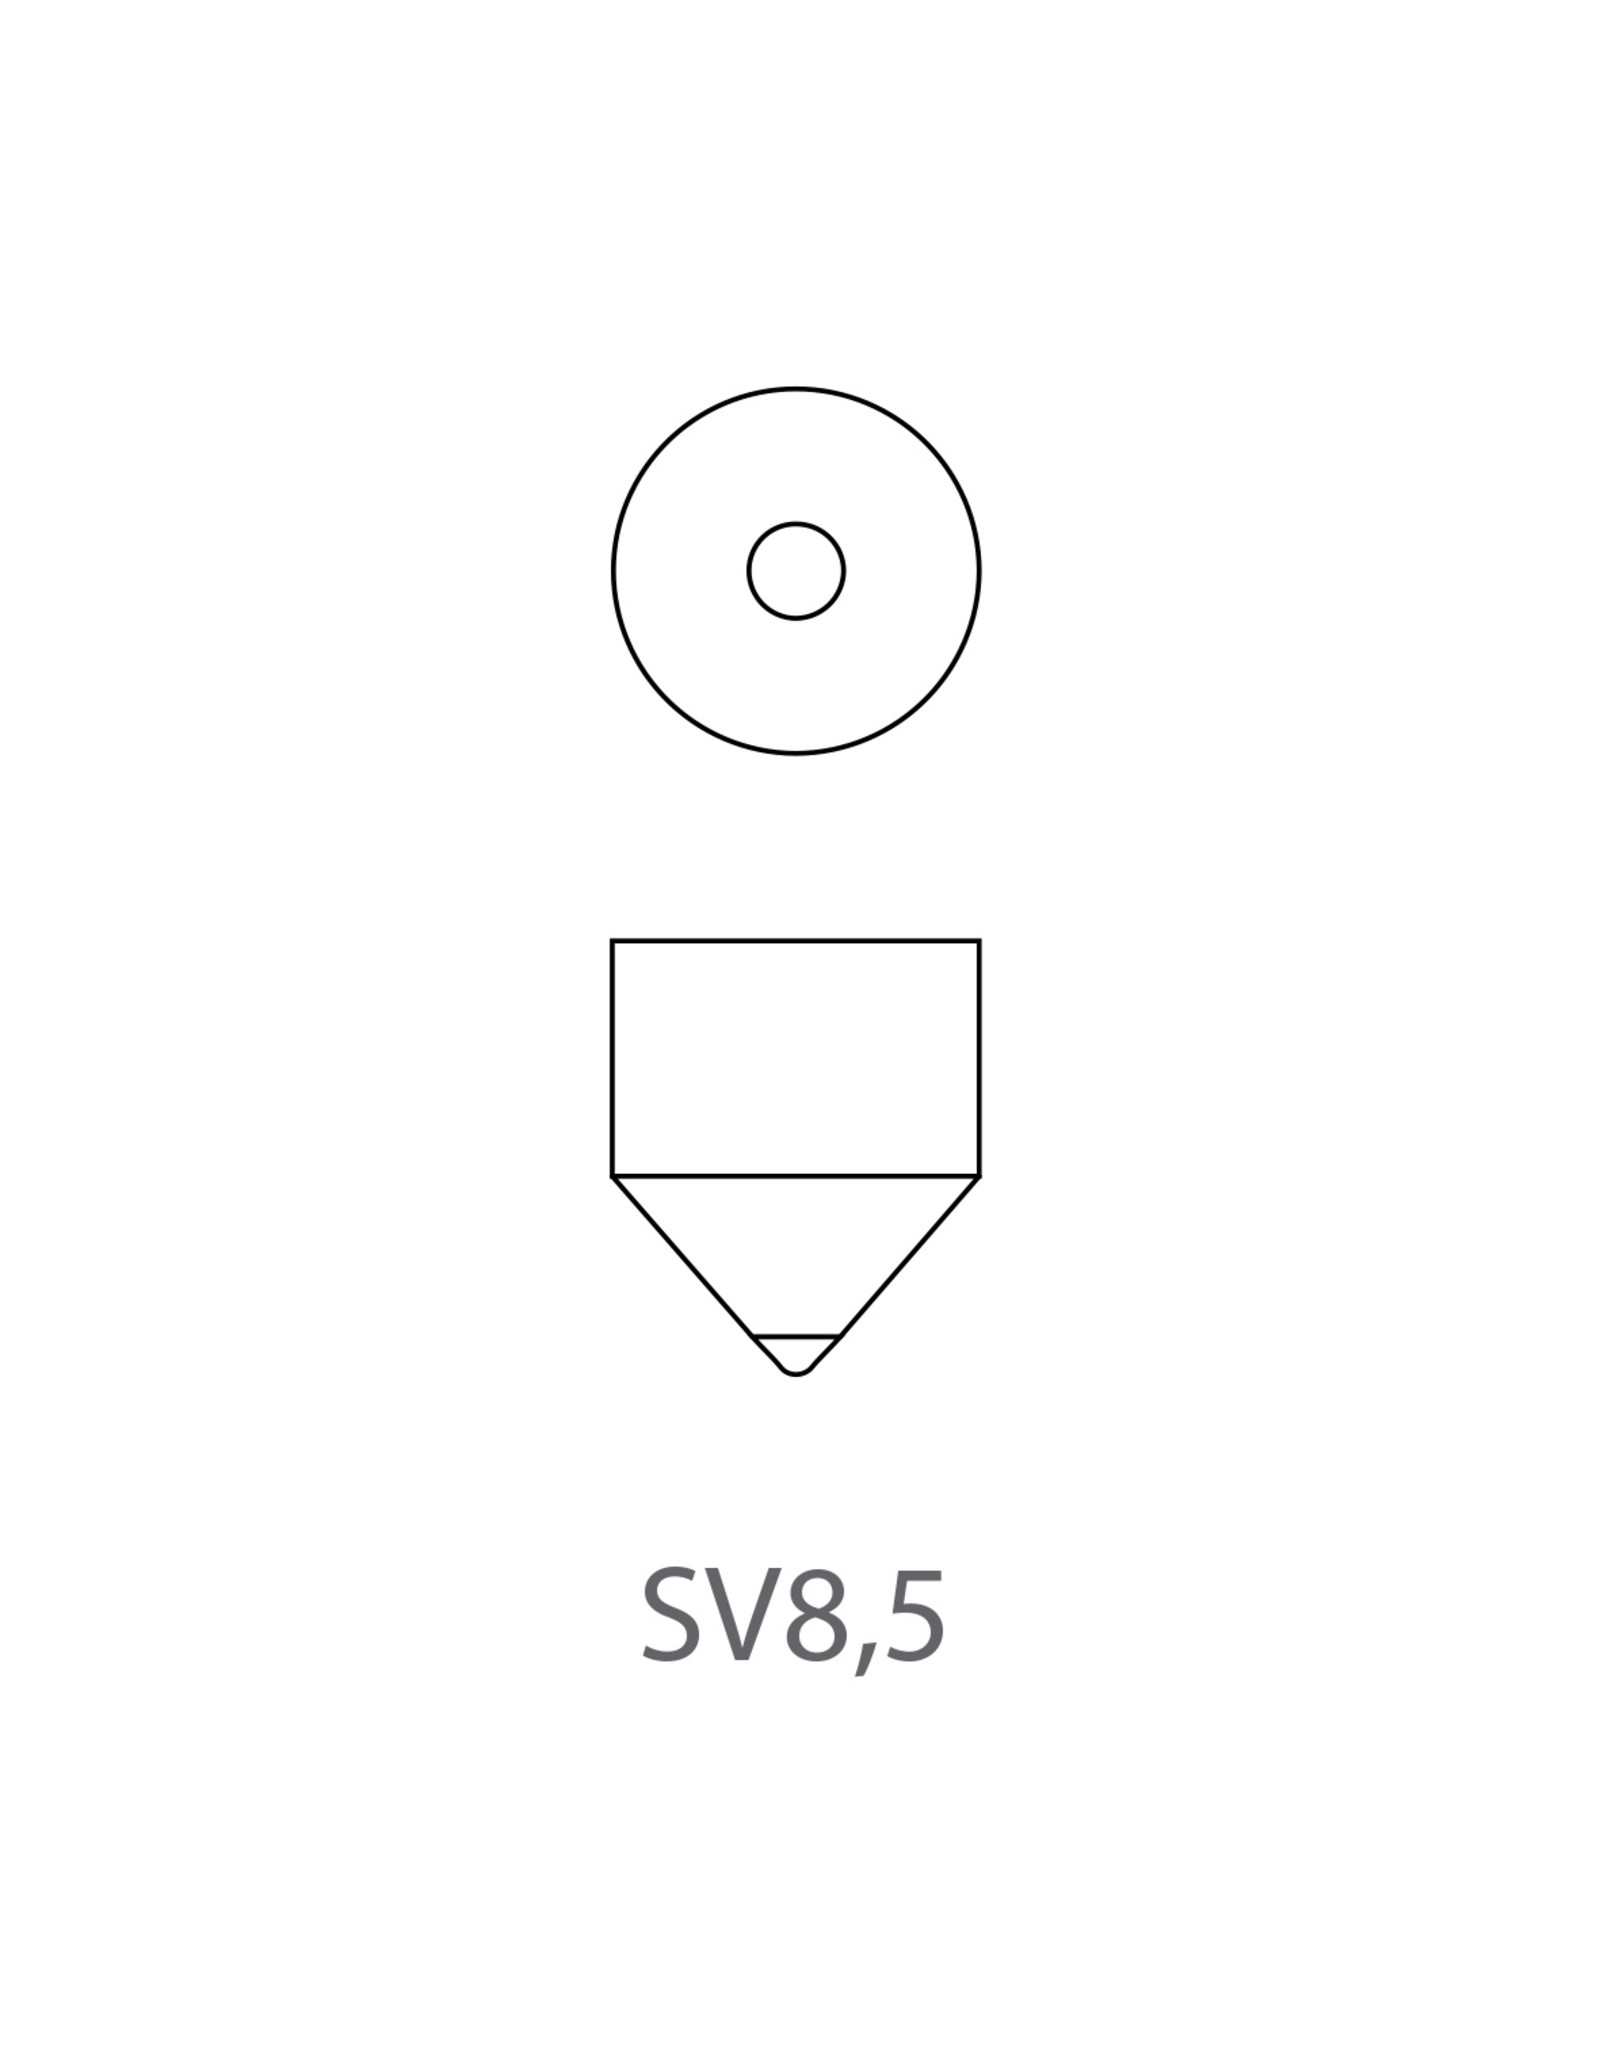 Autolamp 12V 10W SV8,5 11x38 2x